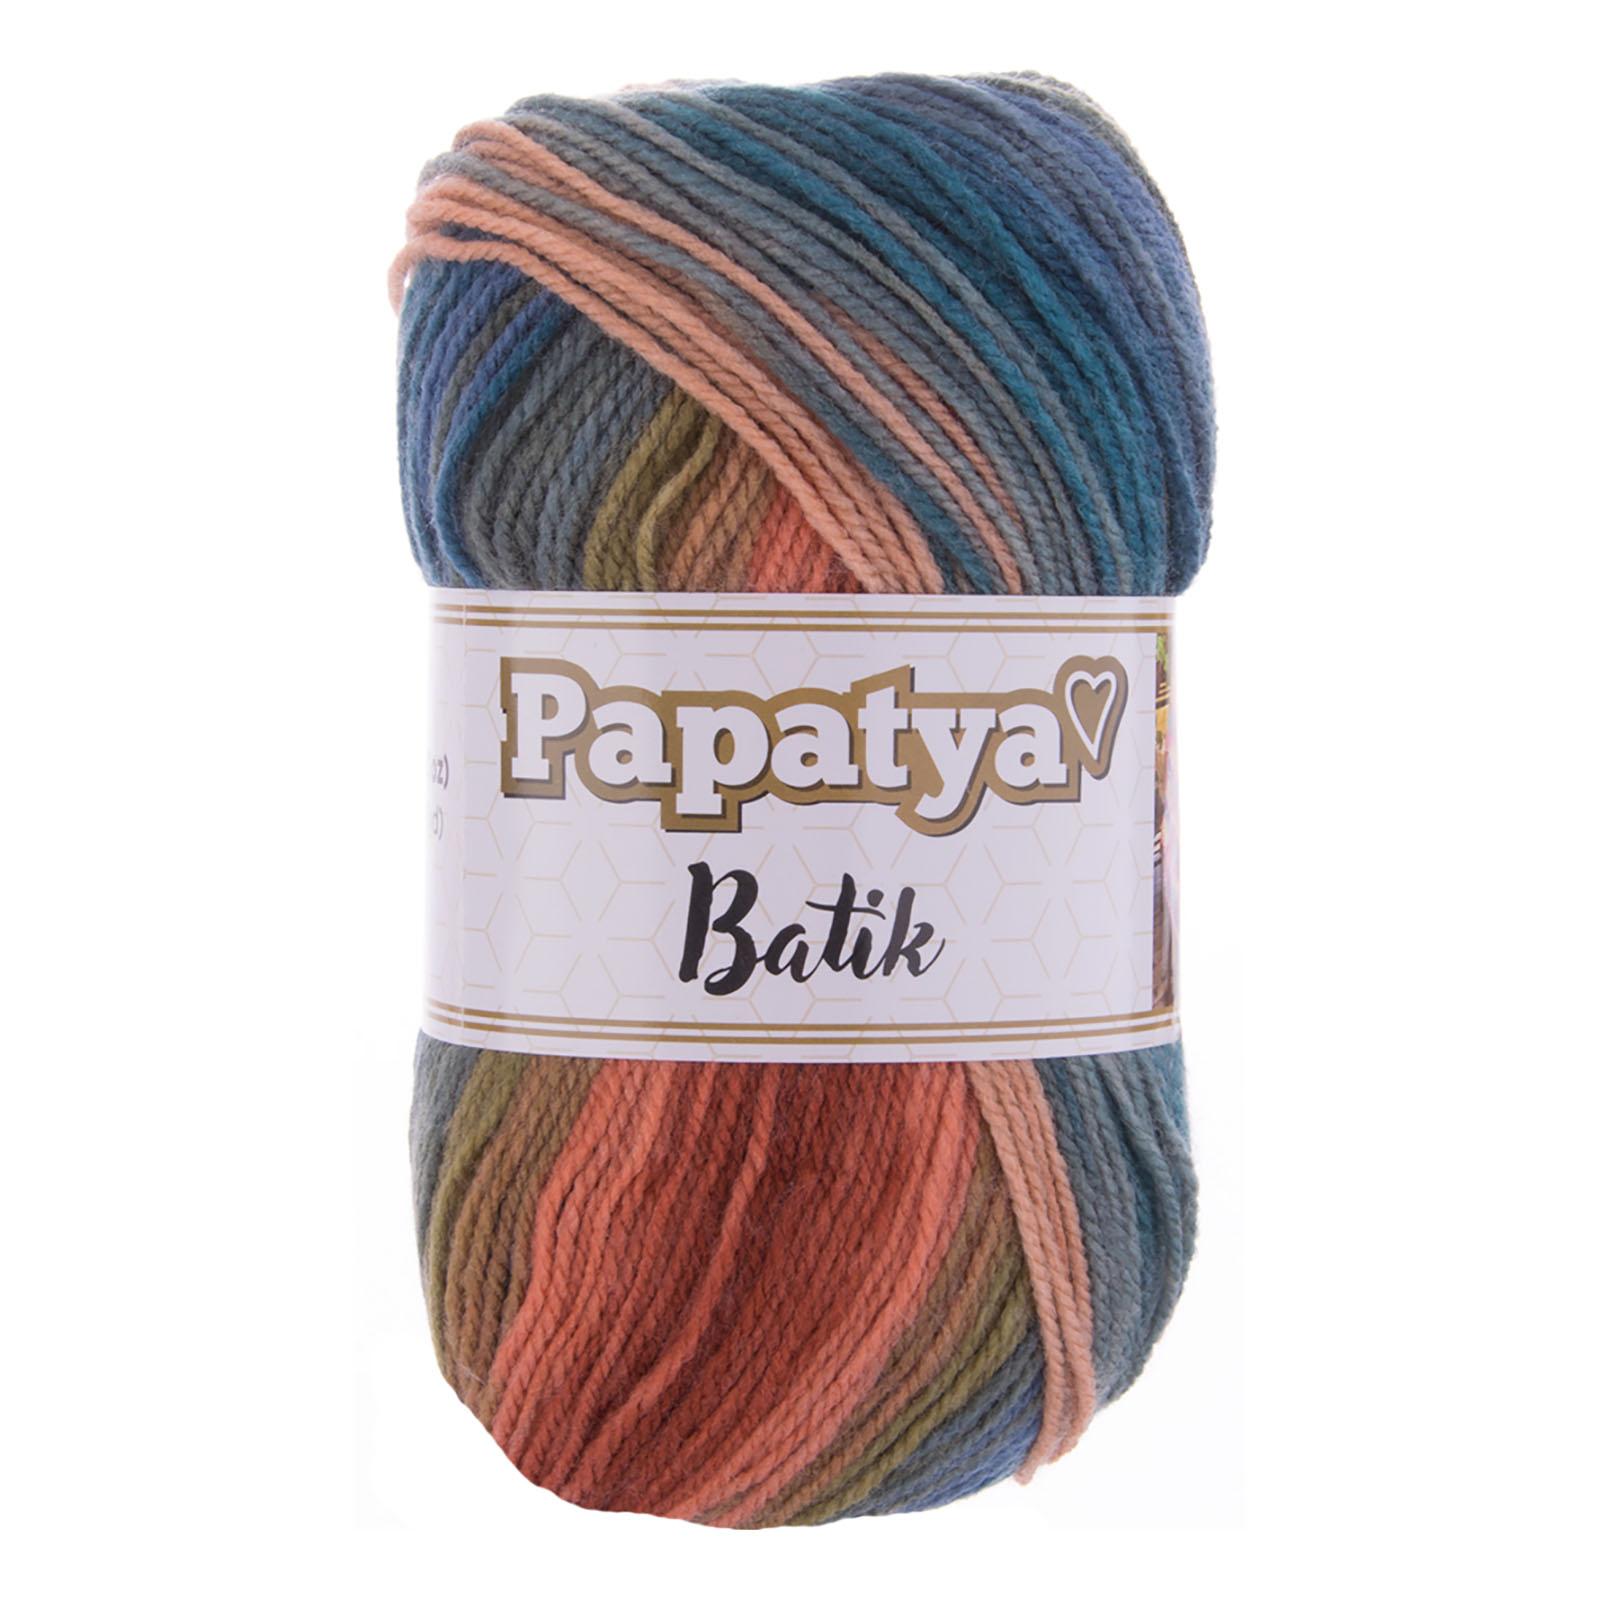 100g Farbverlaufsgarn Papatya Batik Strick-Wolle Strickgarn Häkelgarn Farbwahl – Bild 5